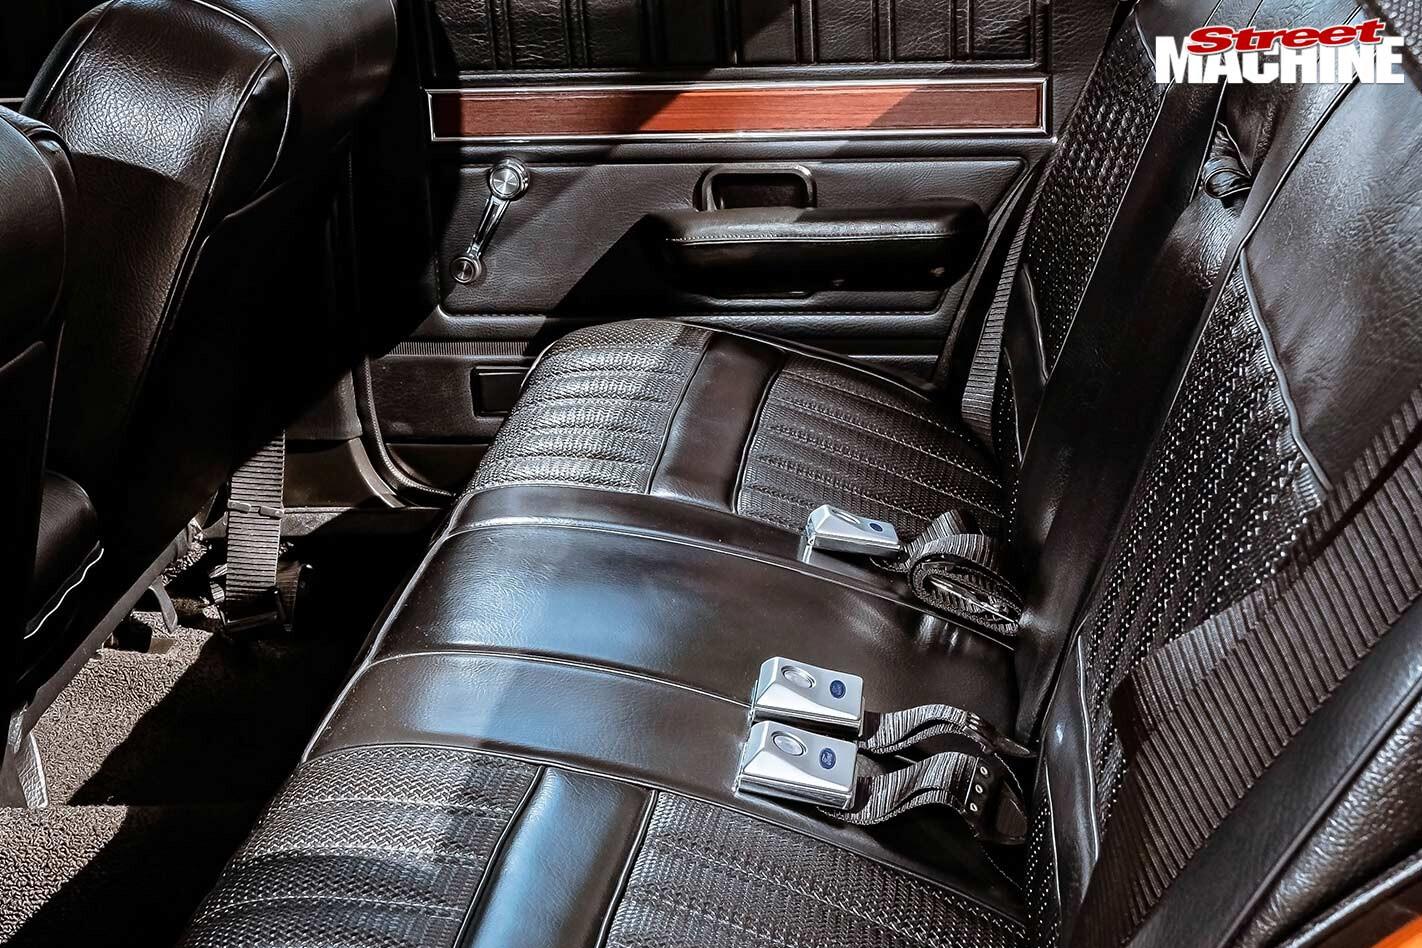 Ford XY Fairmont rear seat